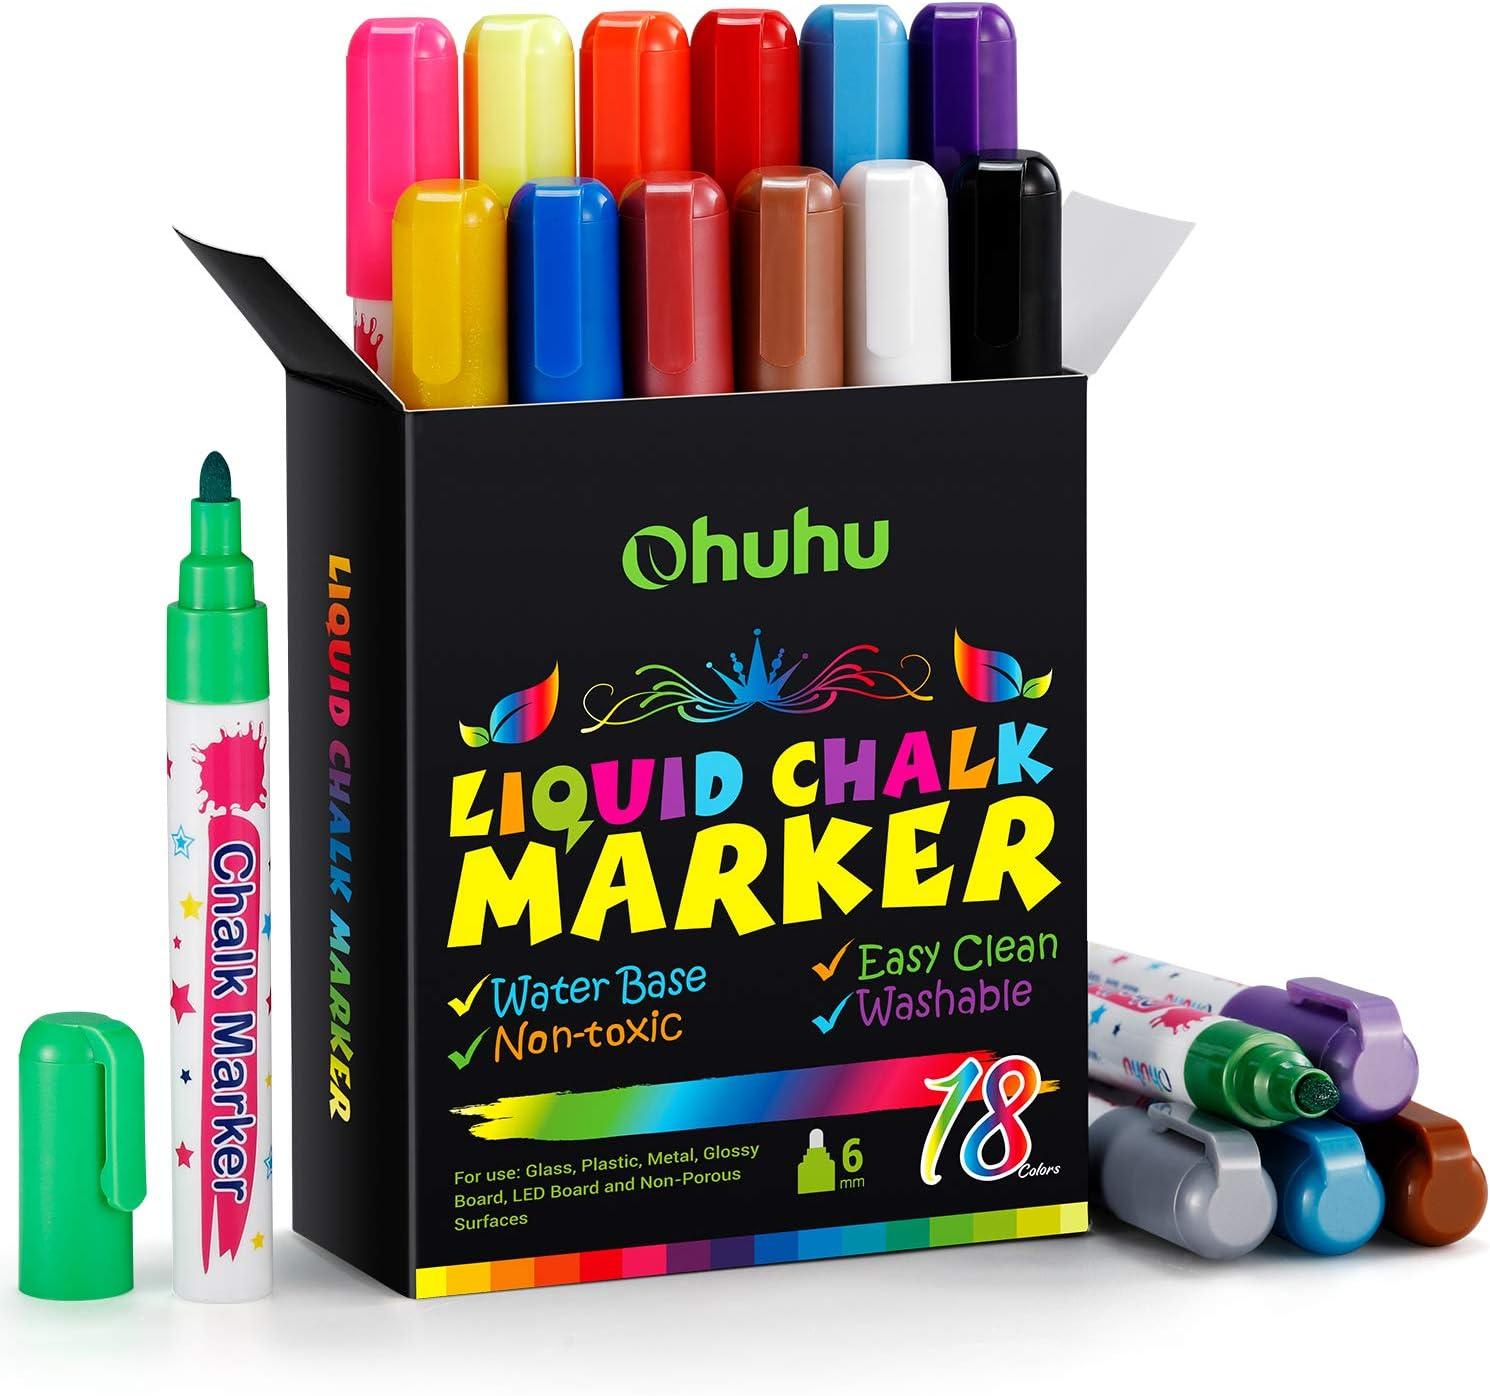 Liquid Chalk Marker & Metallic Colors Set, Ohuhu 18 Colors Chalk Pens for Chalkboard, Blackboards, Window, Glass, Bistro, 6mm Erasable Ink Chalk Markers Pen with Reversible Bullet & Chisel Tip